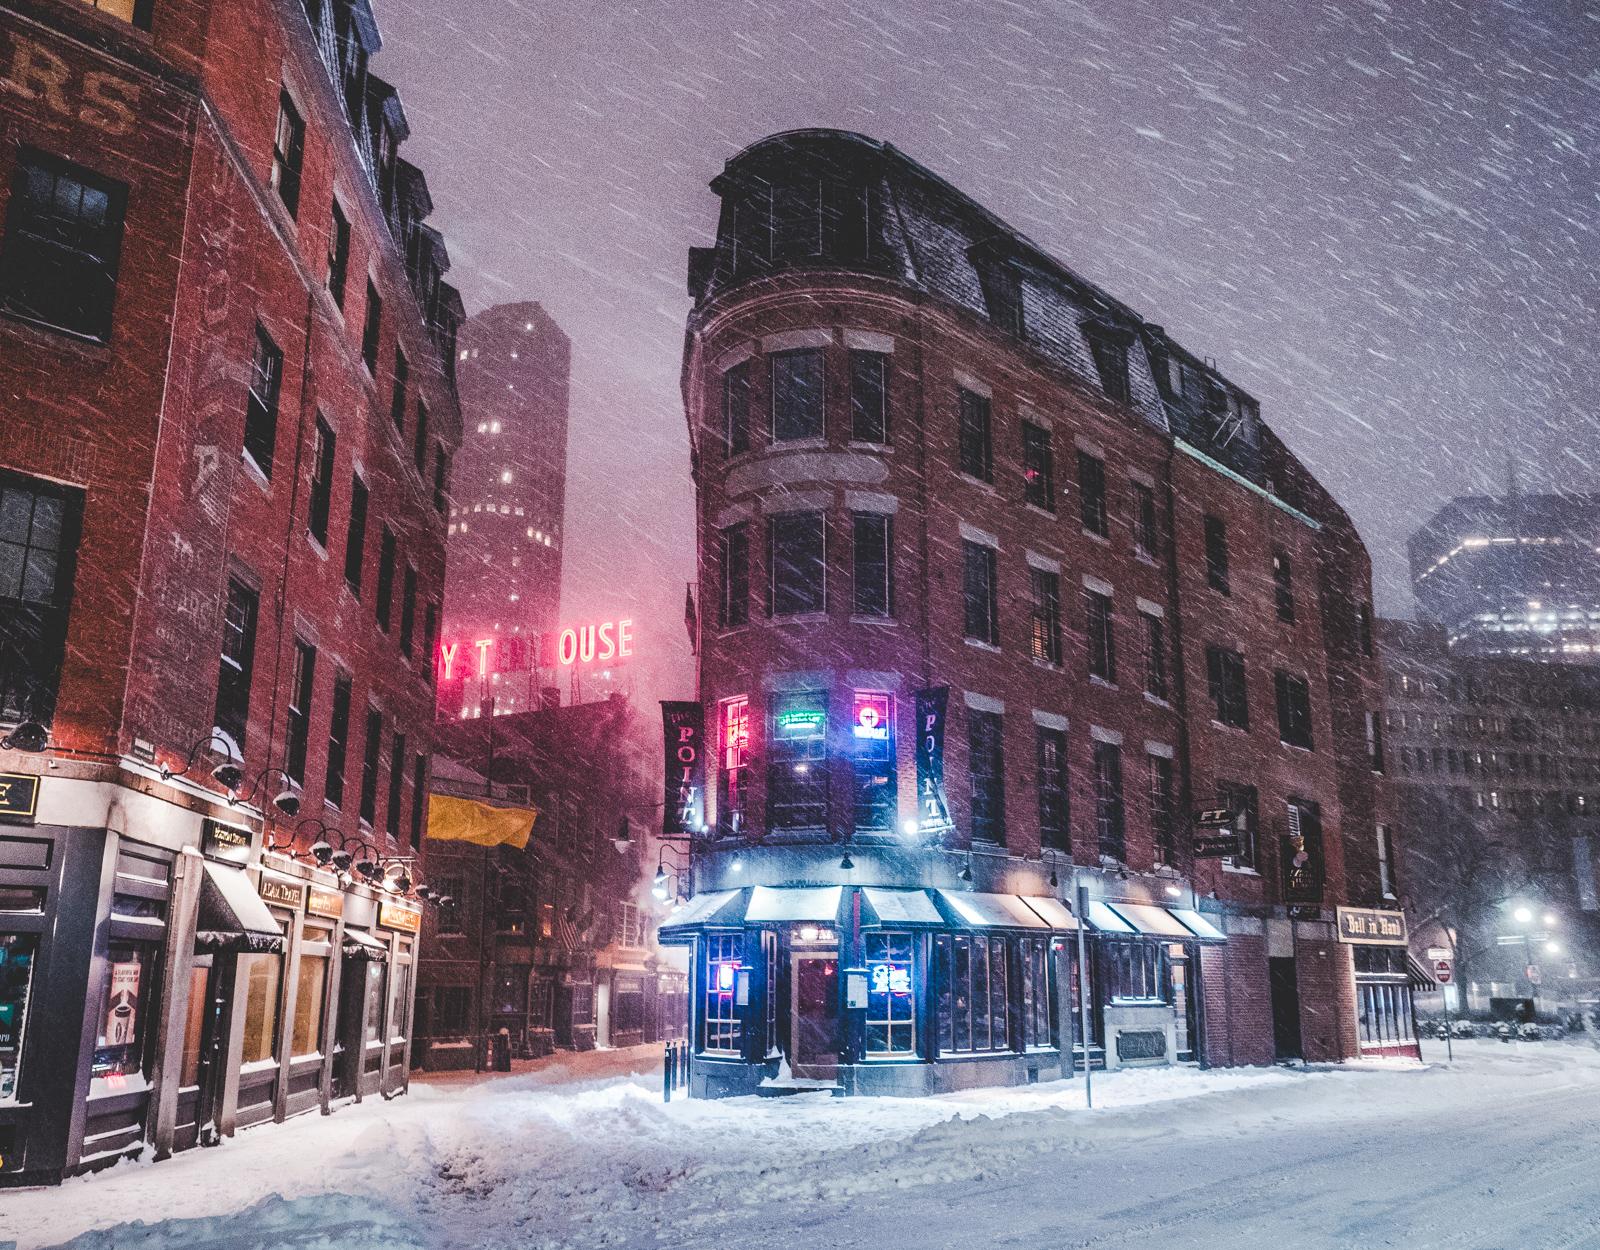 the snowstorm in Boston.